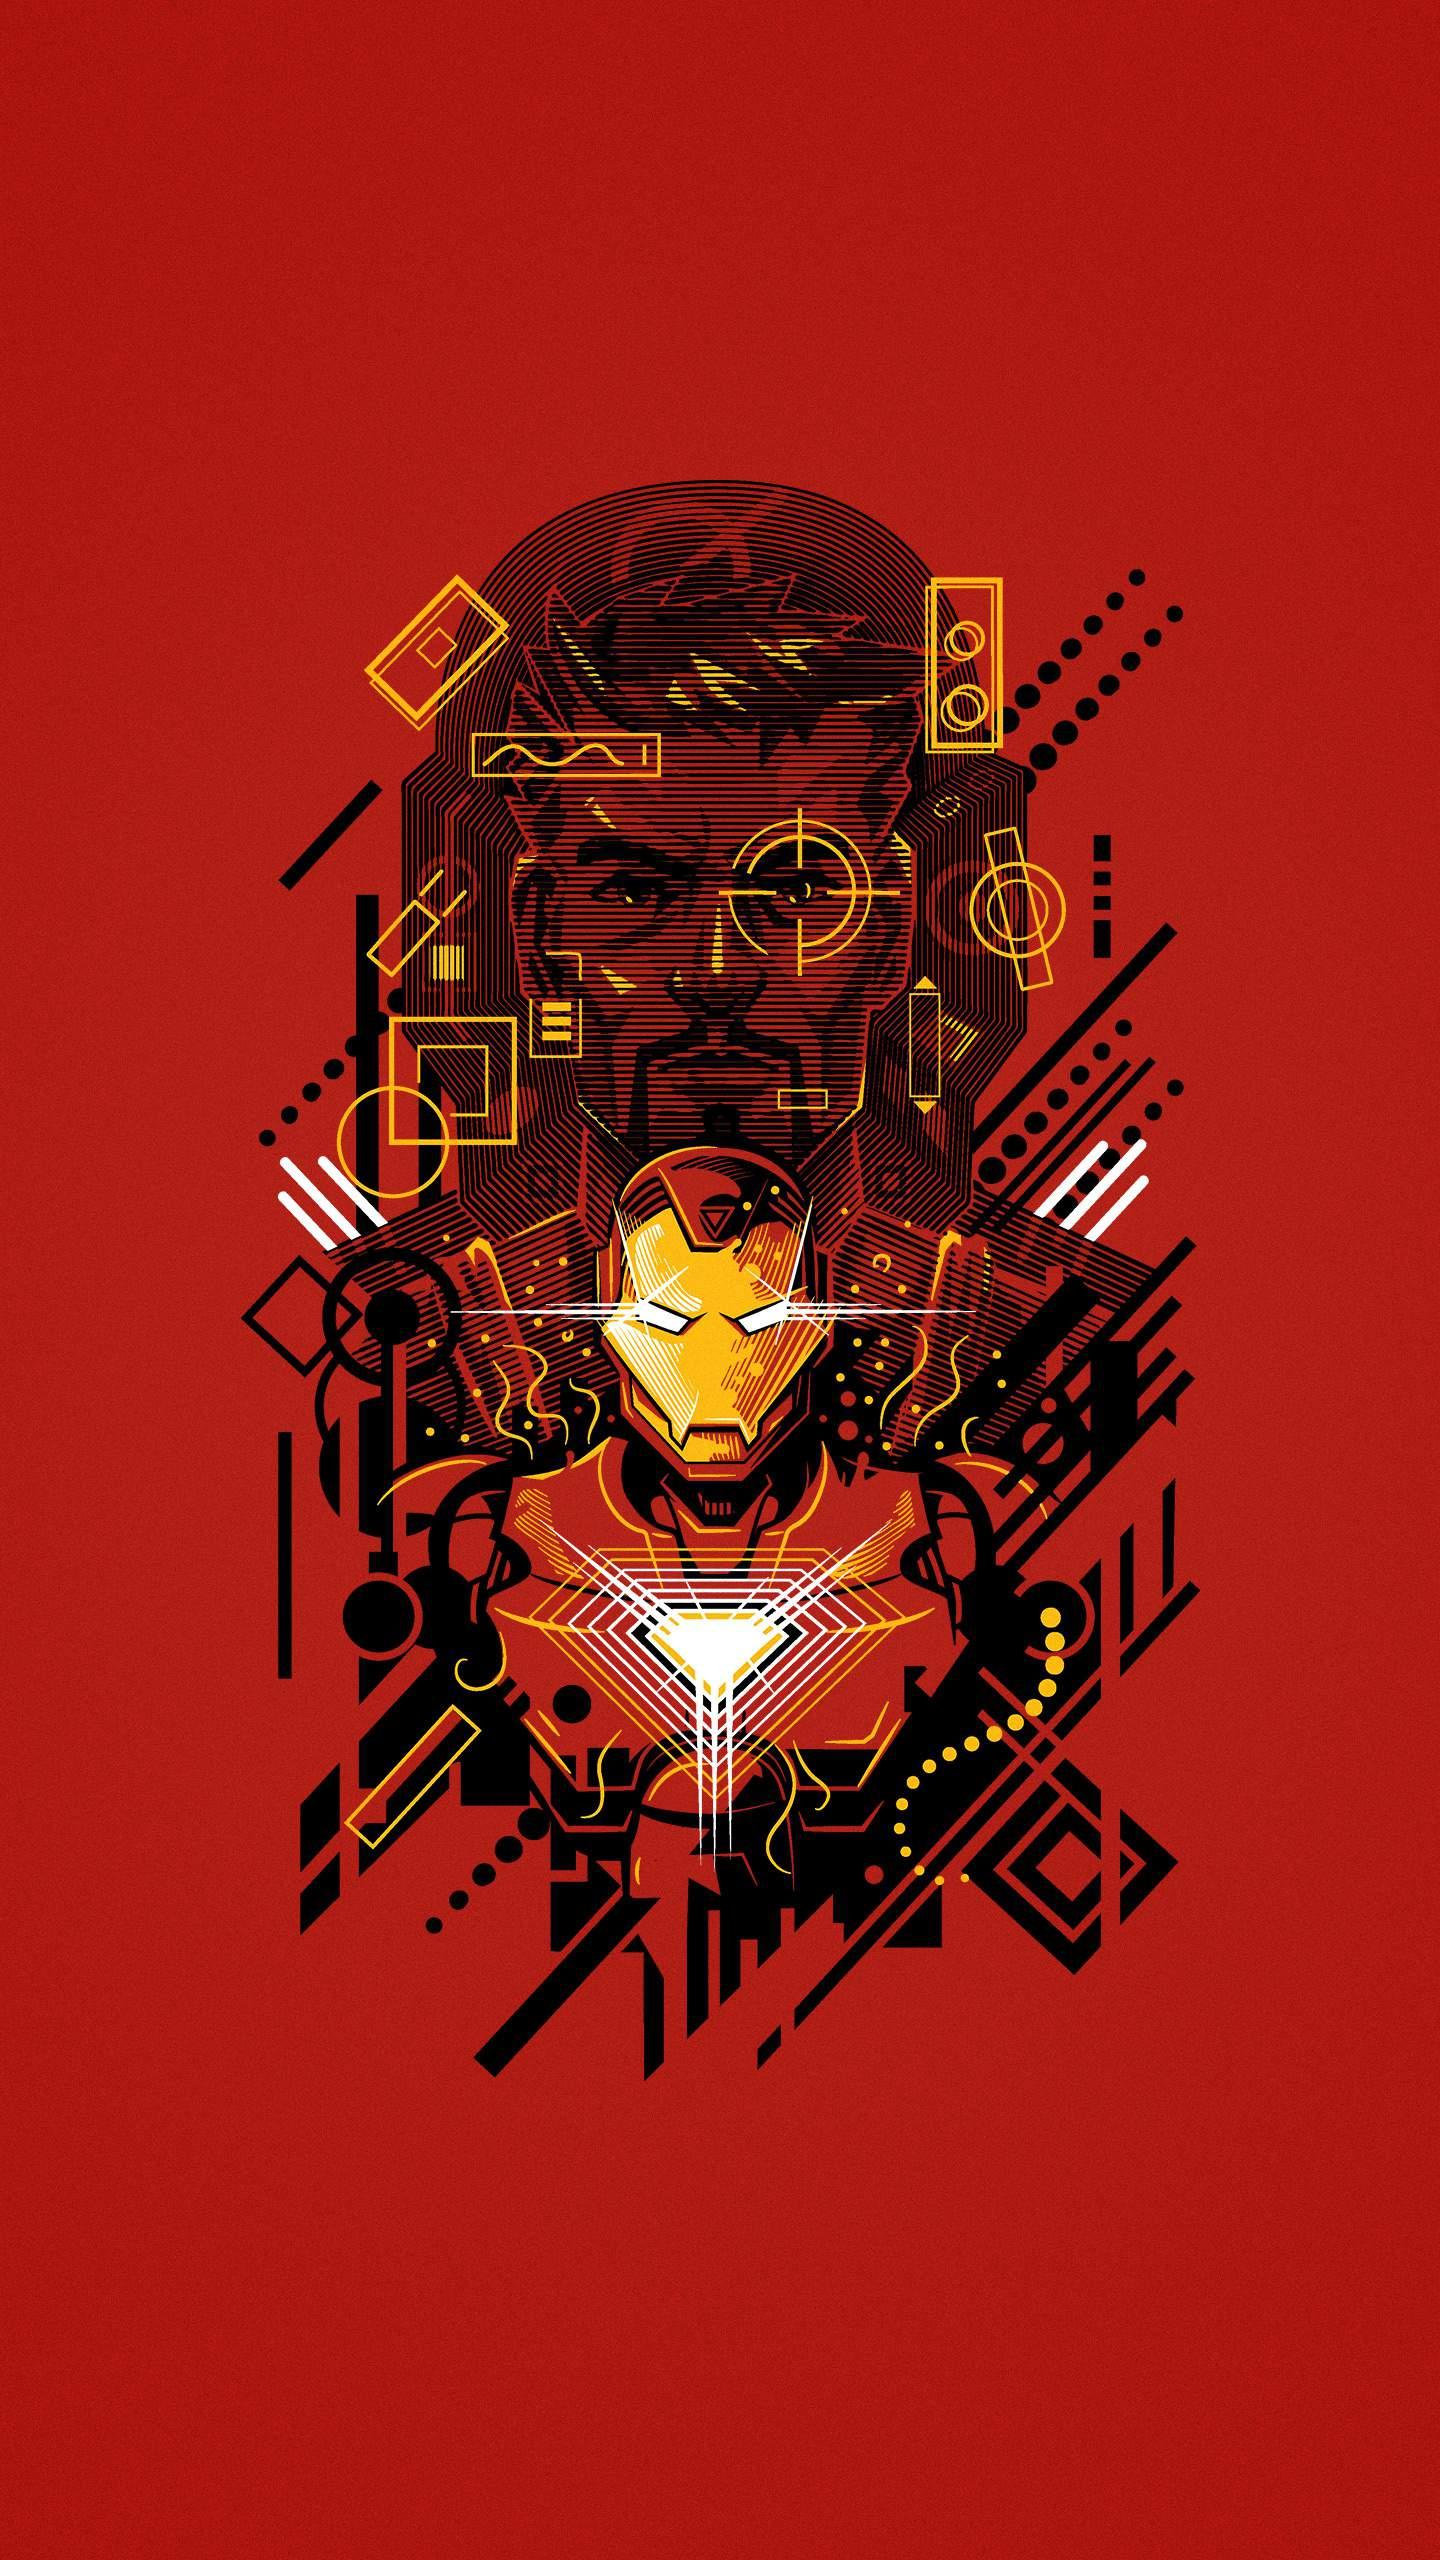 Anime Quotes Desktop Wallpaper Iron Man Tony Stark Iphone Wallpaper Iphone Wallpapers